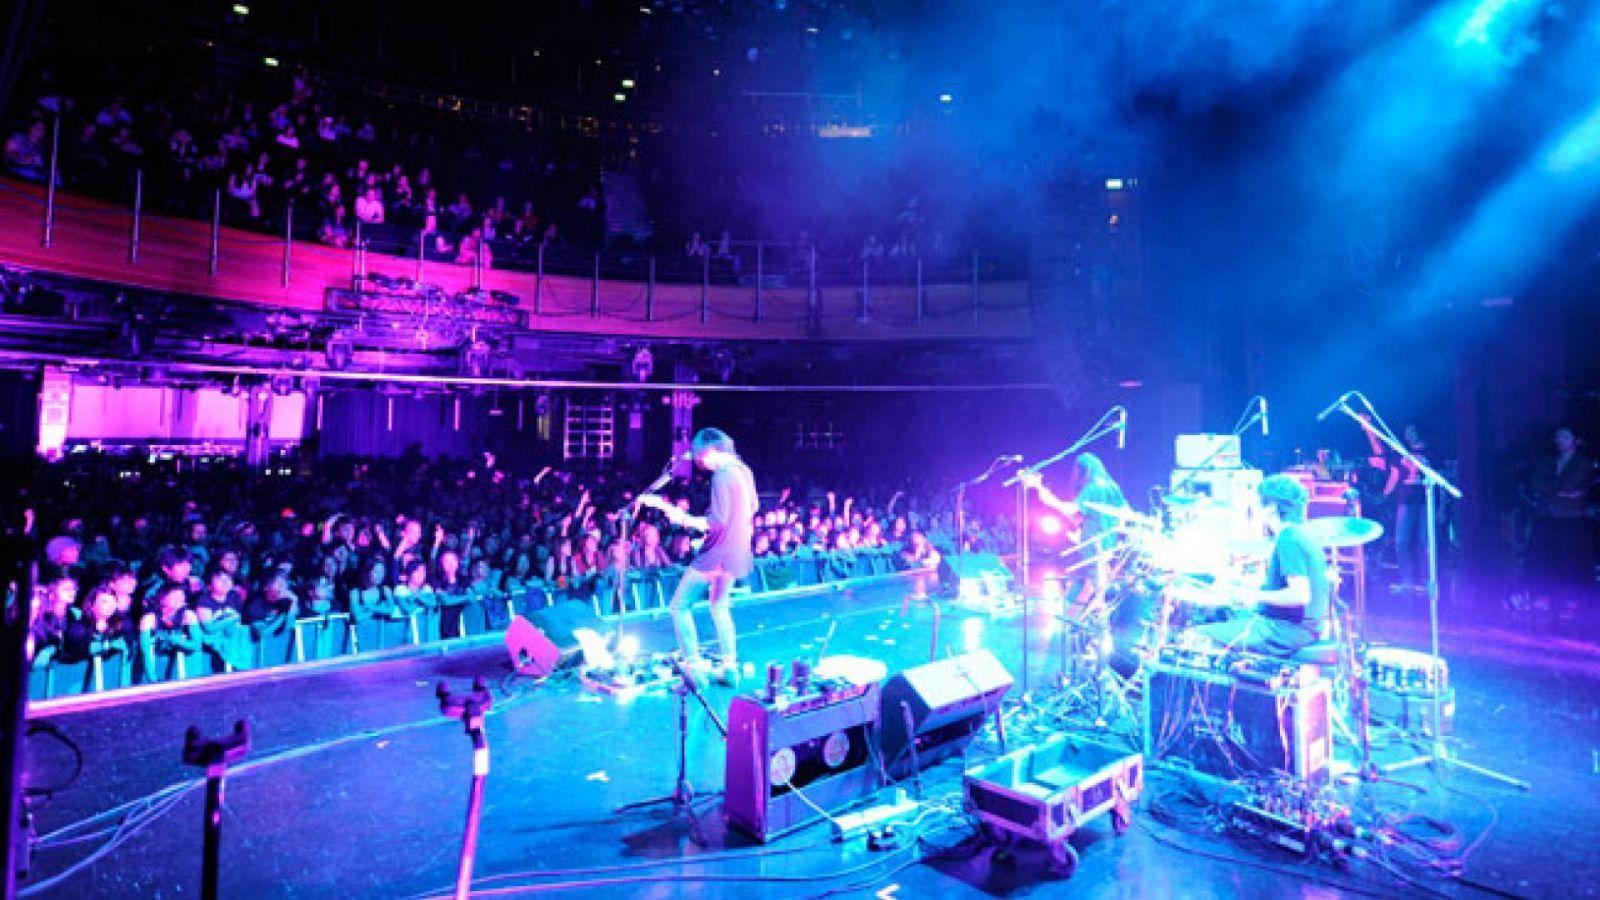 JAPAN NIGHT at HYPER JAPAN in London: Night #2 © 2015 JAPAN NIGHT